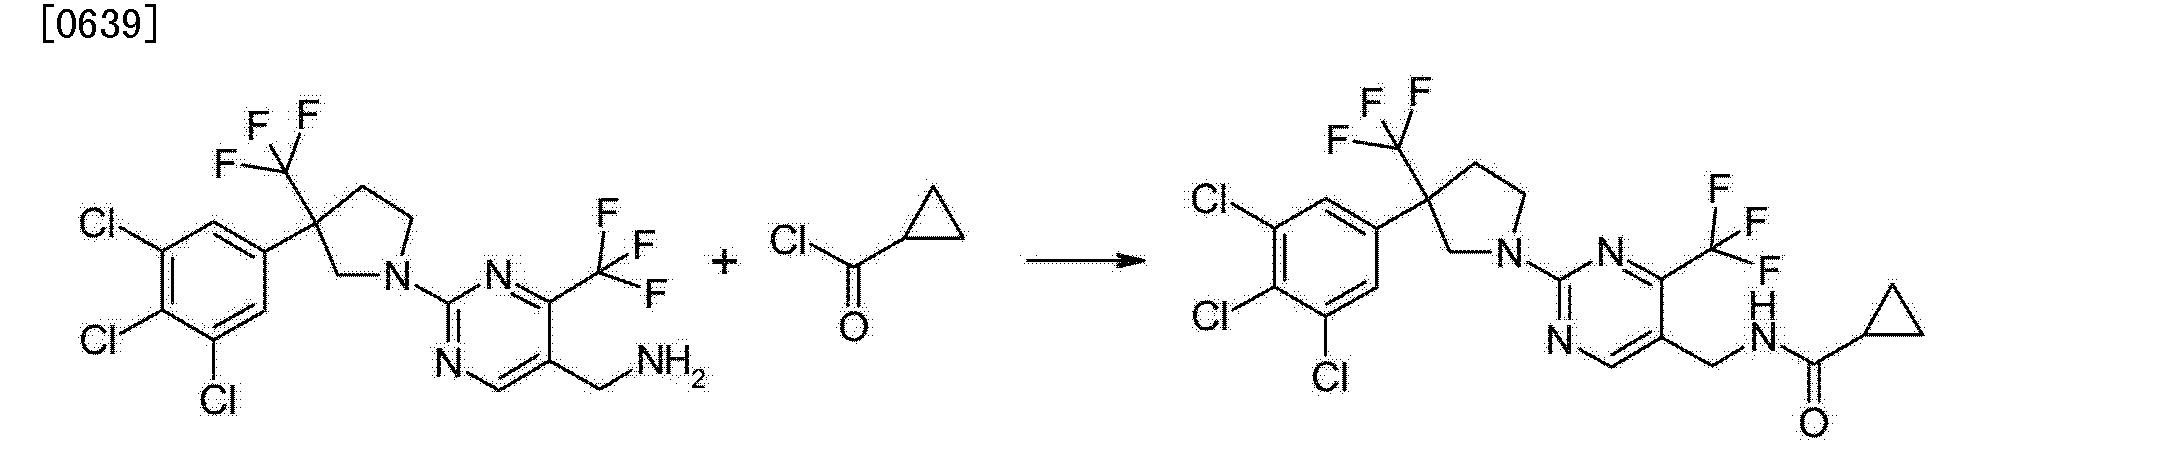 CN103282347B - Pesticidal arylpyrrolidines - Google Patents